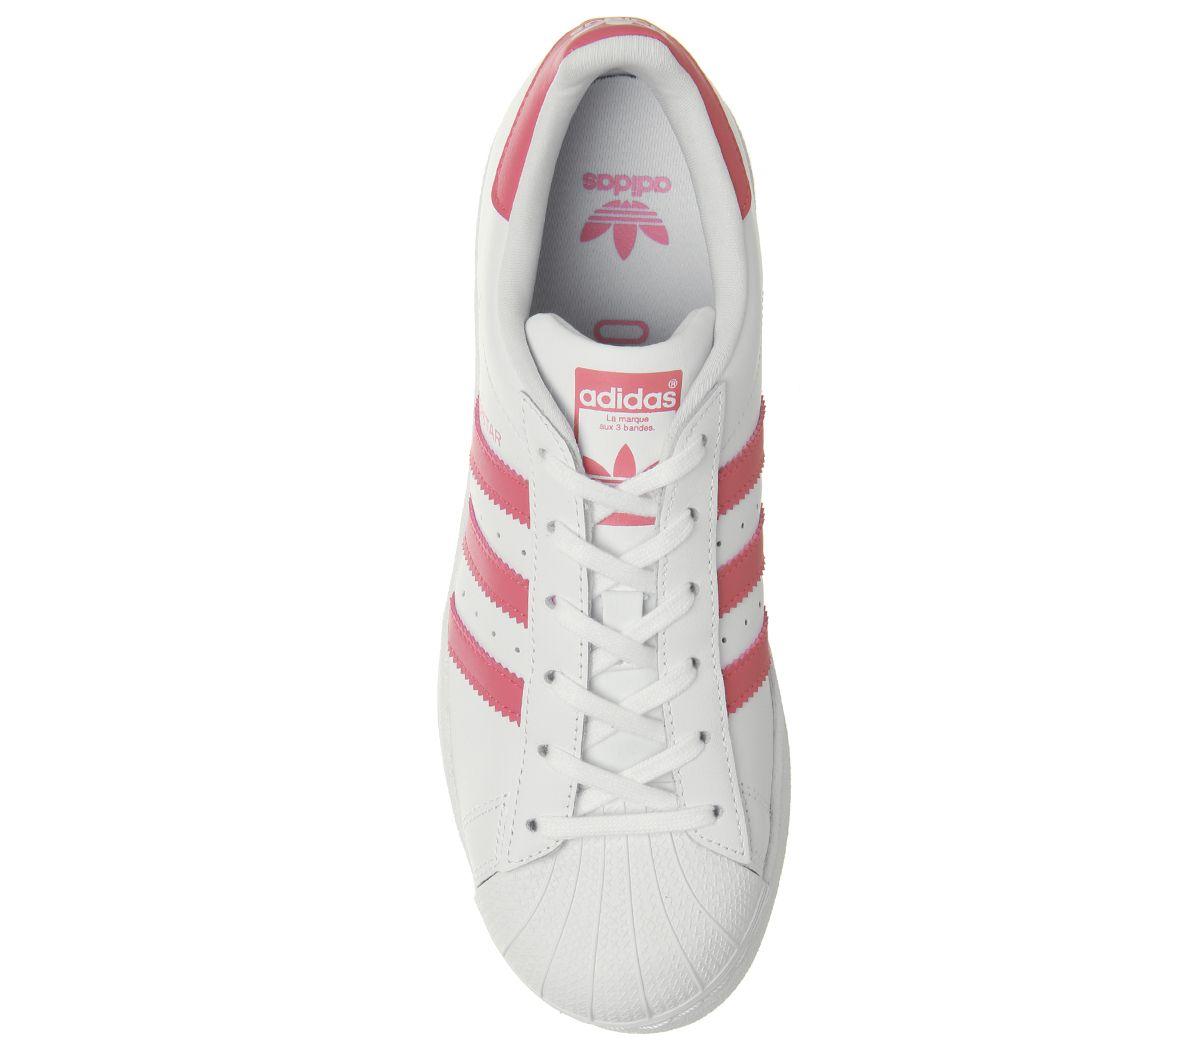 717985dddbb8 Femmes Adidas Superstar Gs Chaussures Blanches Rose Transparent ...